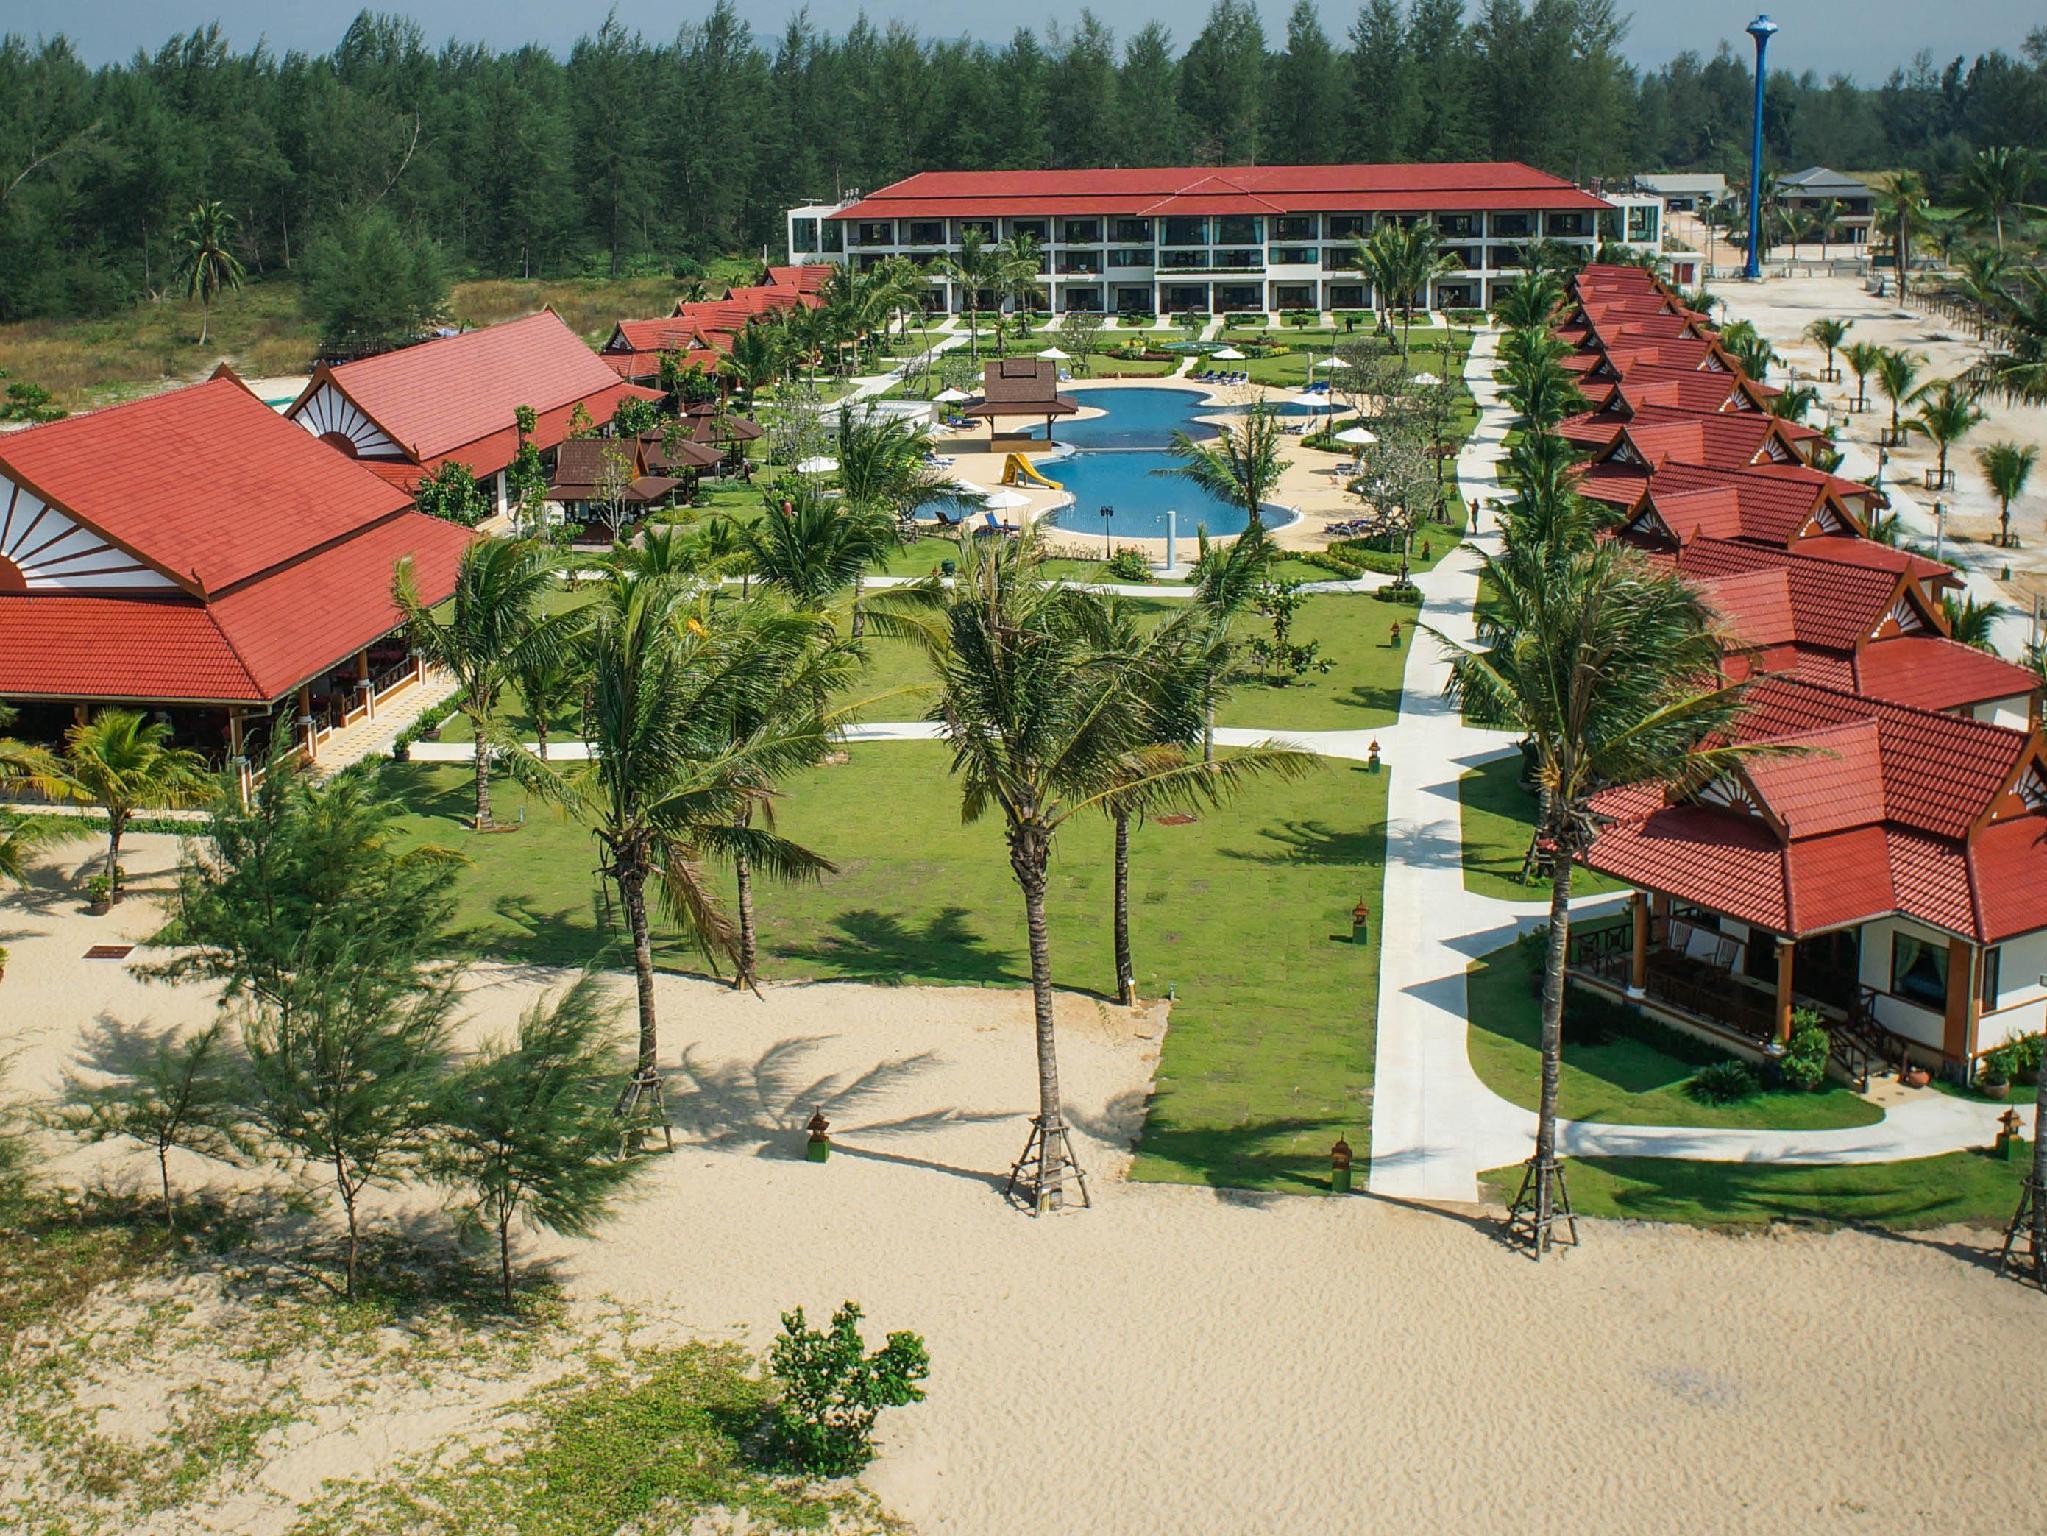 The Sunset Beach Resort Kho Khao Island,เดอะ ซันเซ็ต บีช รีสอร์ต เกาะขาว